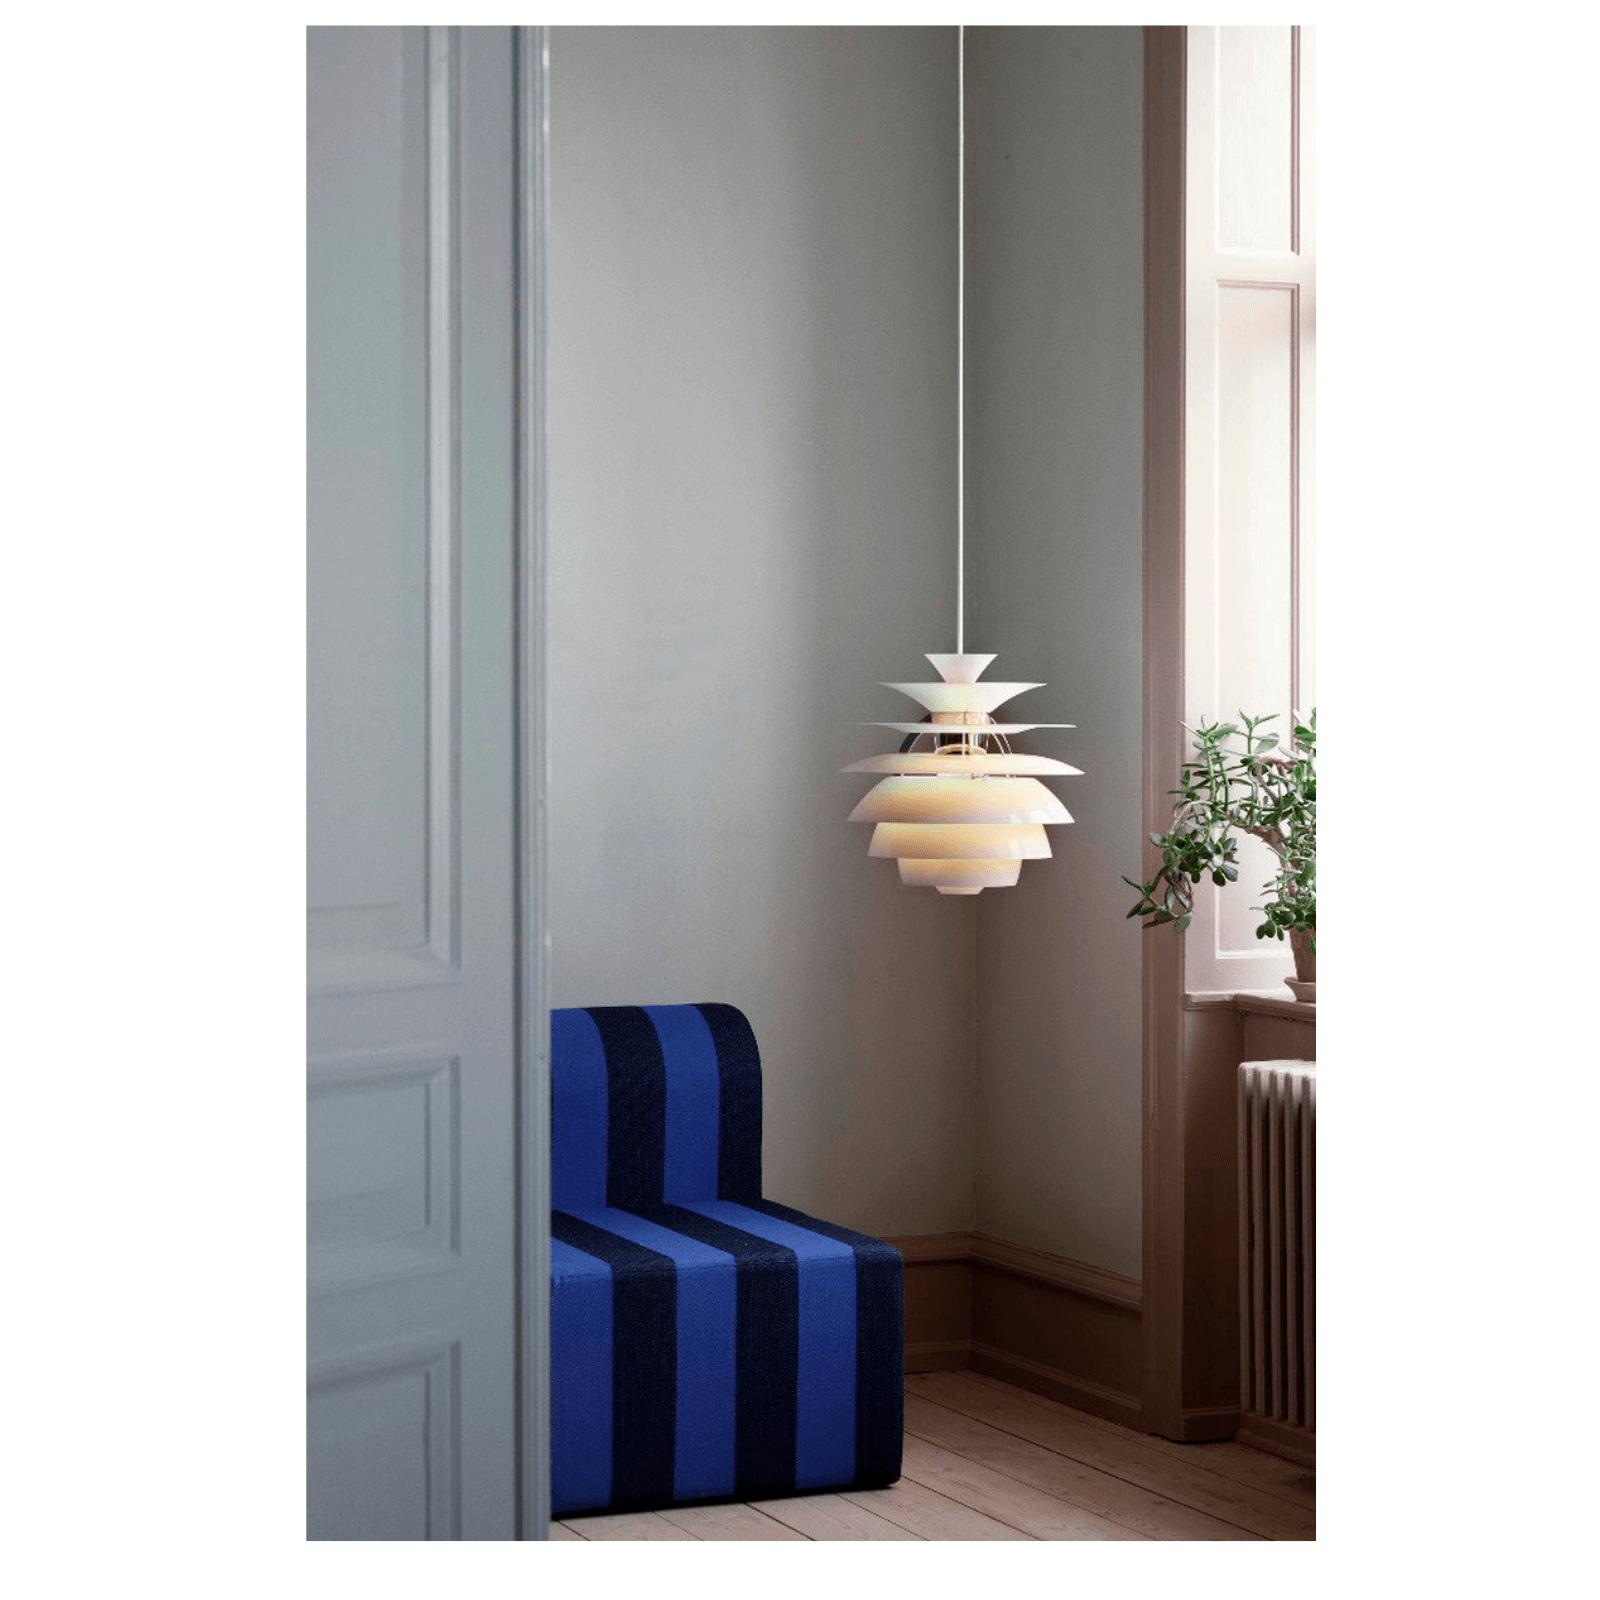 Two Design Lovers Louis Poulsen Snowball Pendant